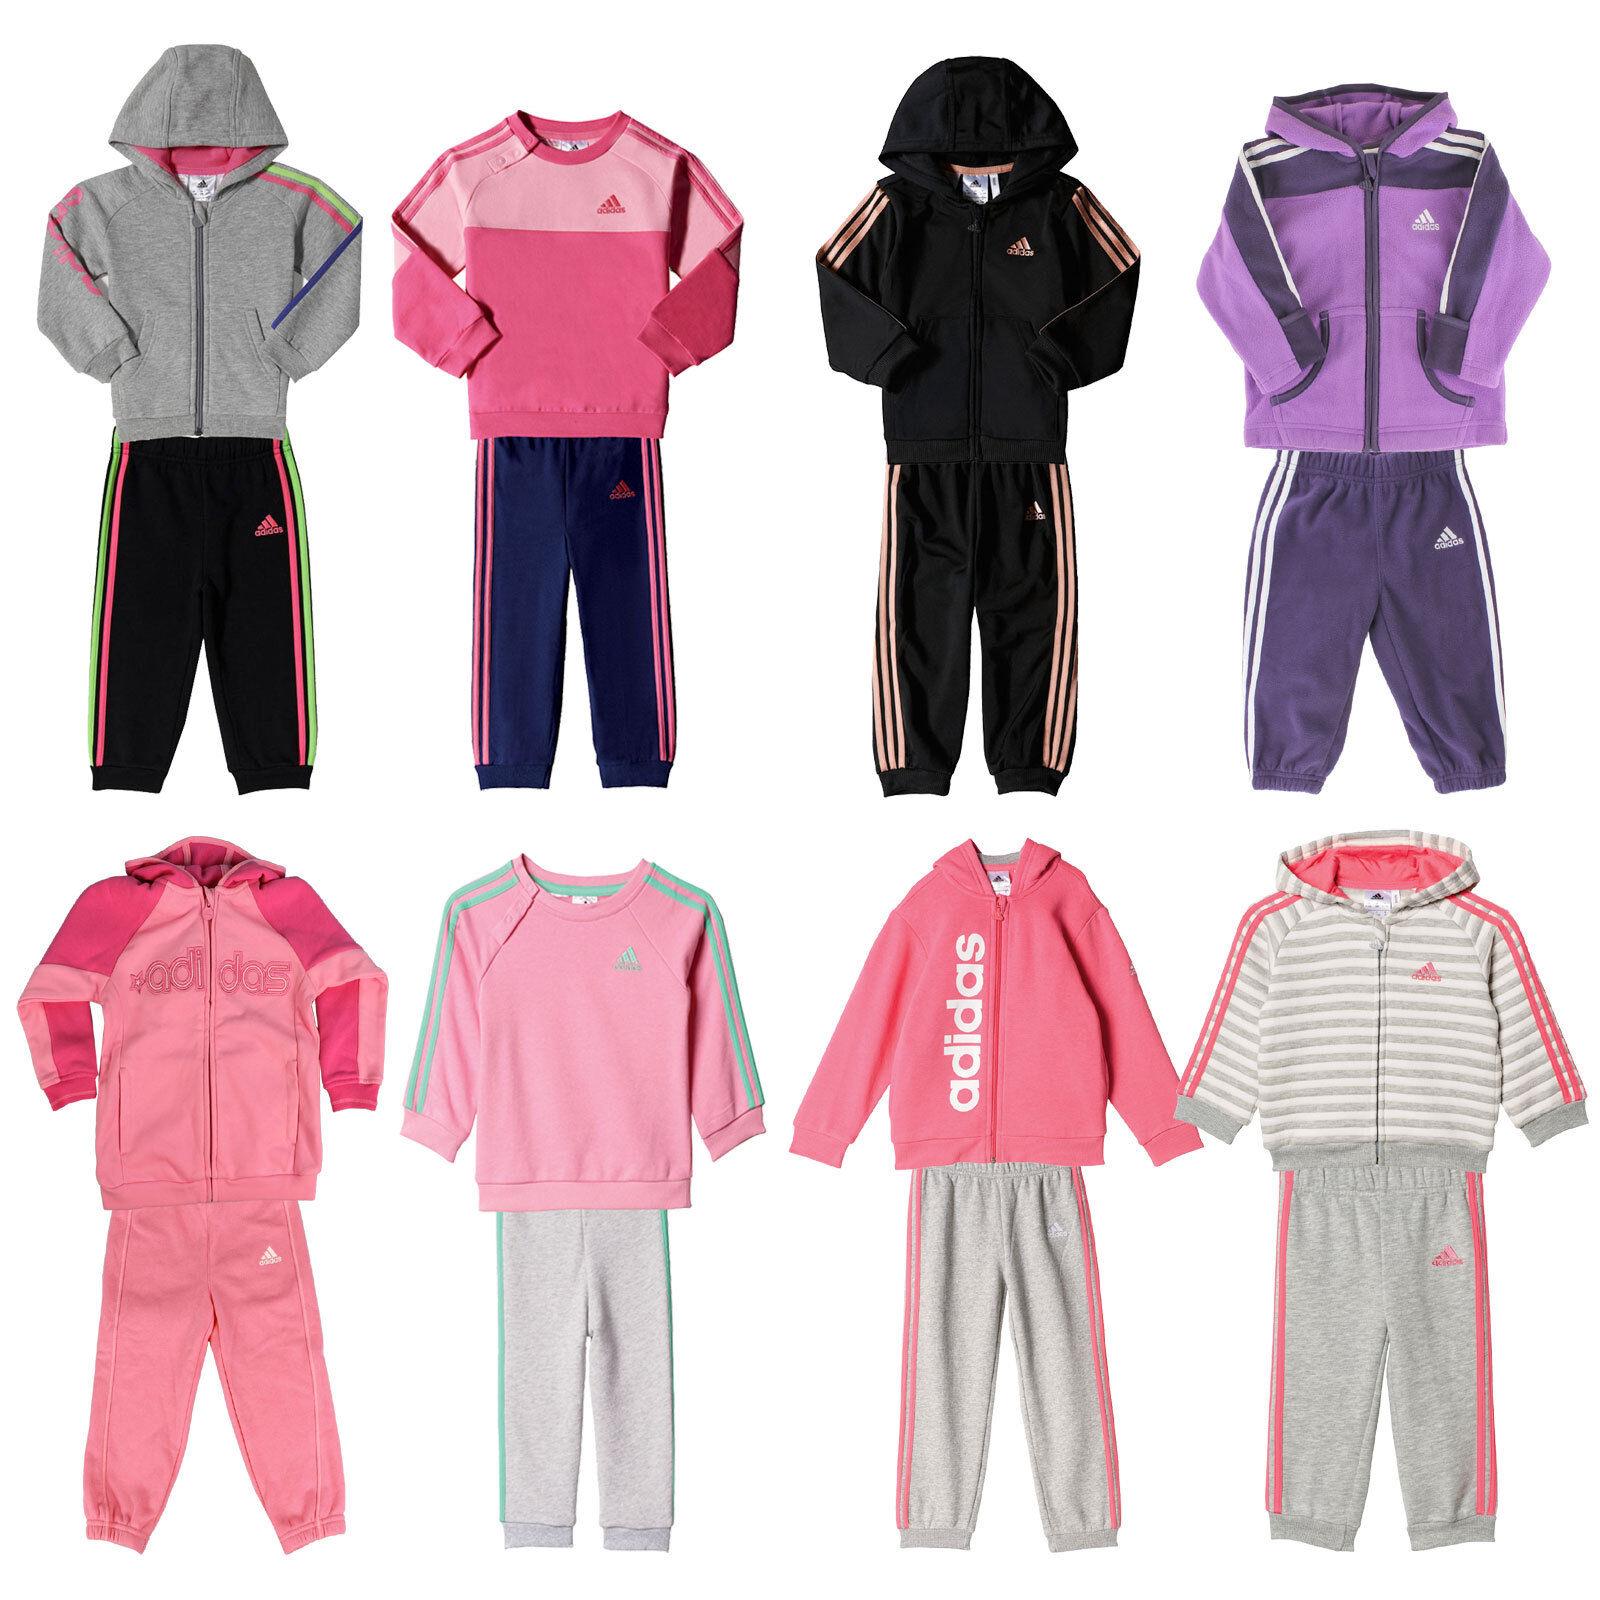 adidas Performance Baby-Jogger Kinder-Jogginganzug Mädchen-Trainingsanzug Set